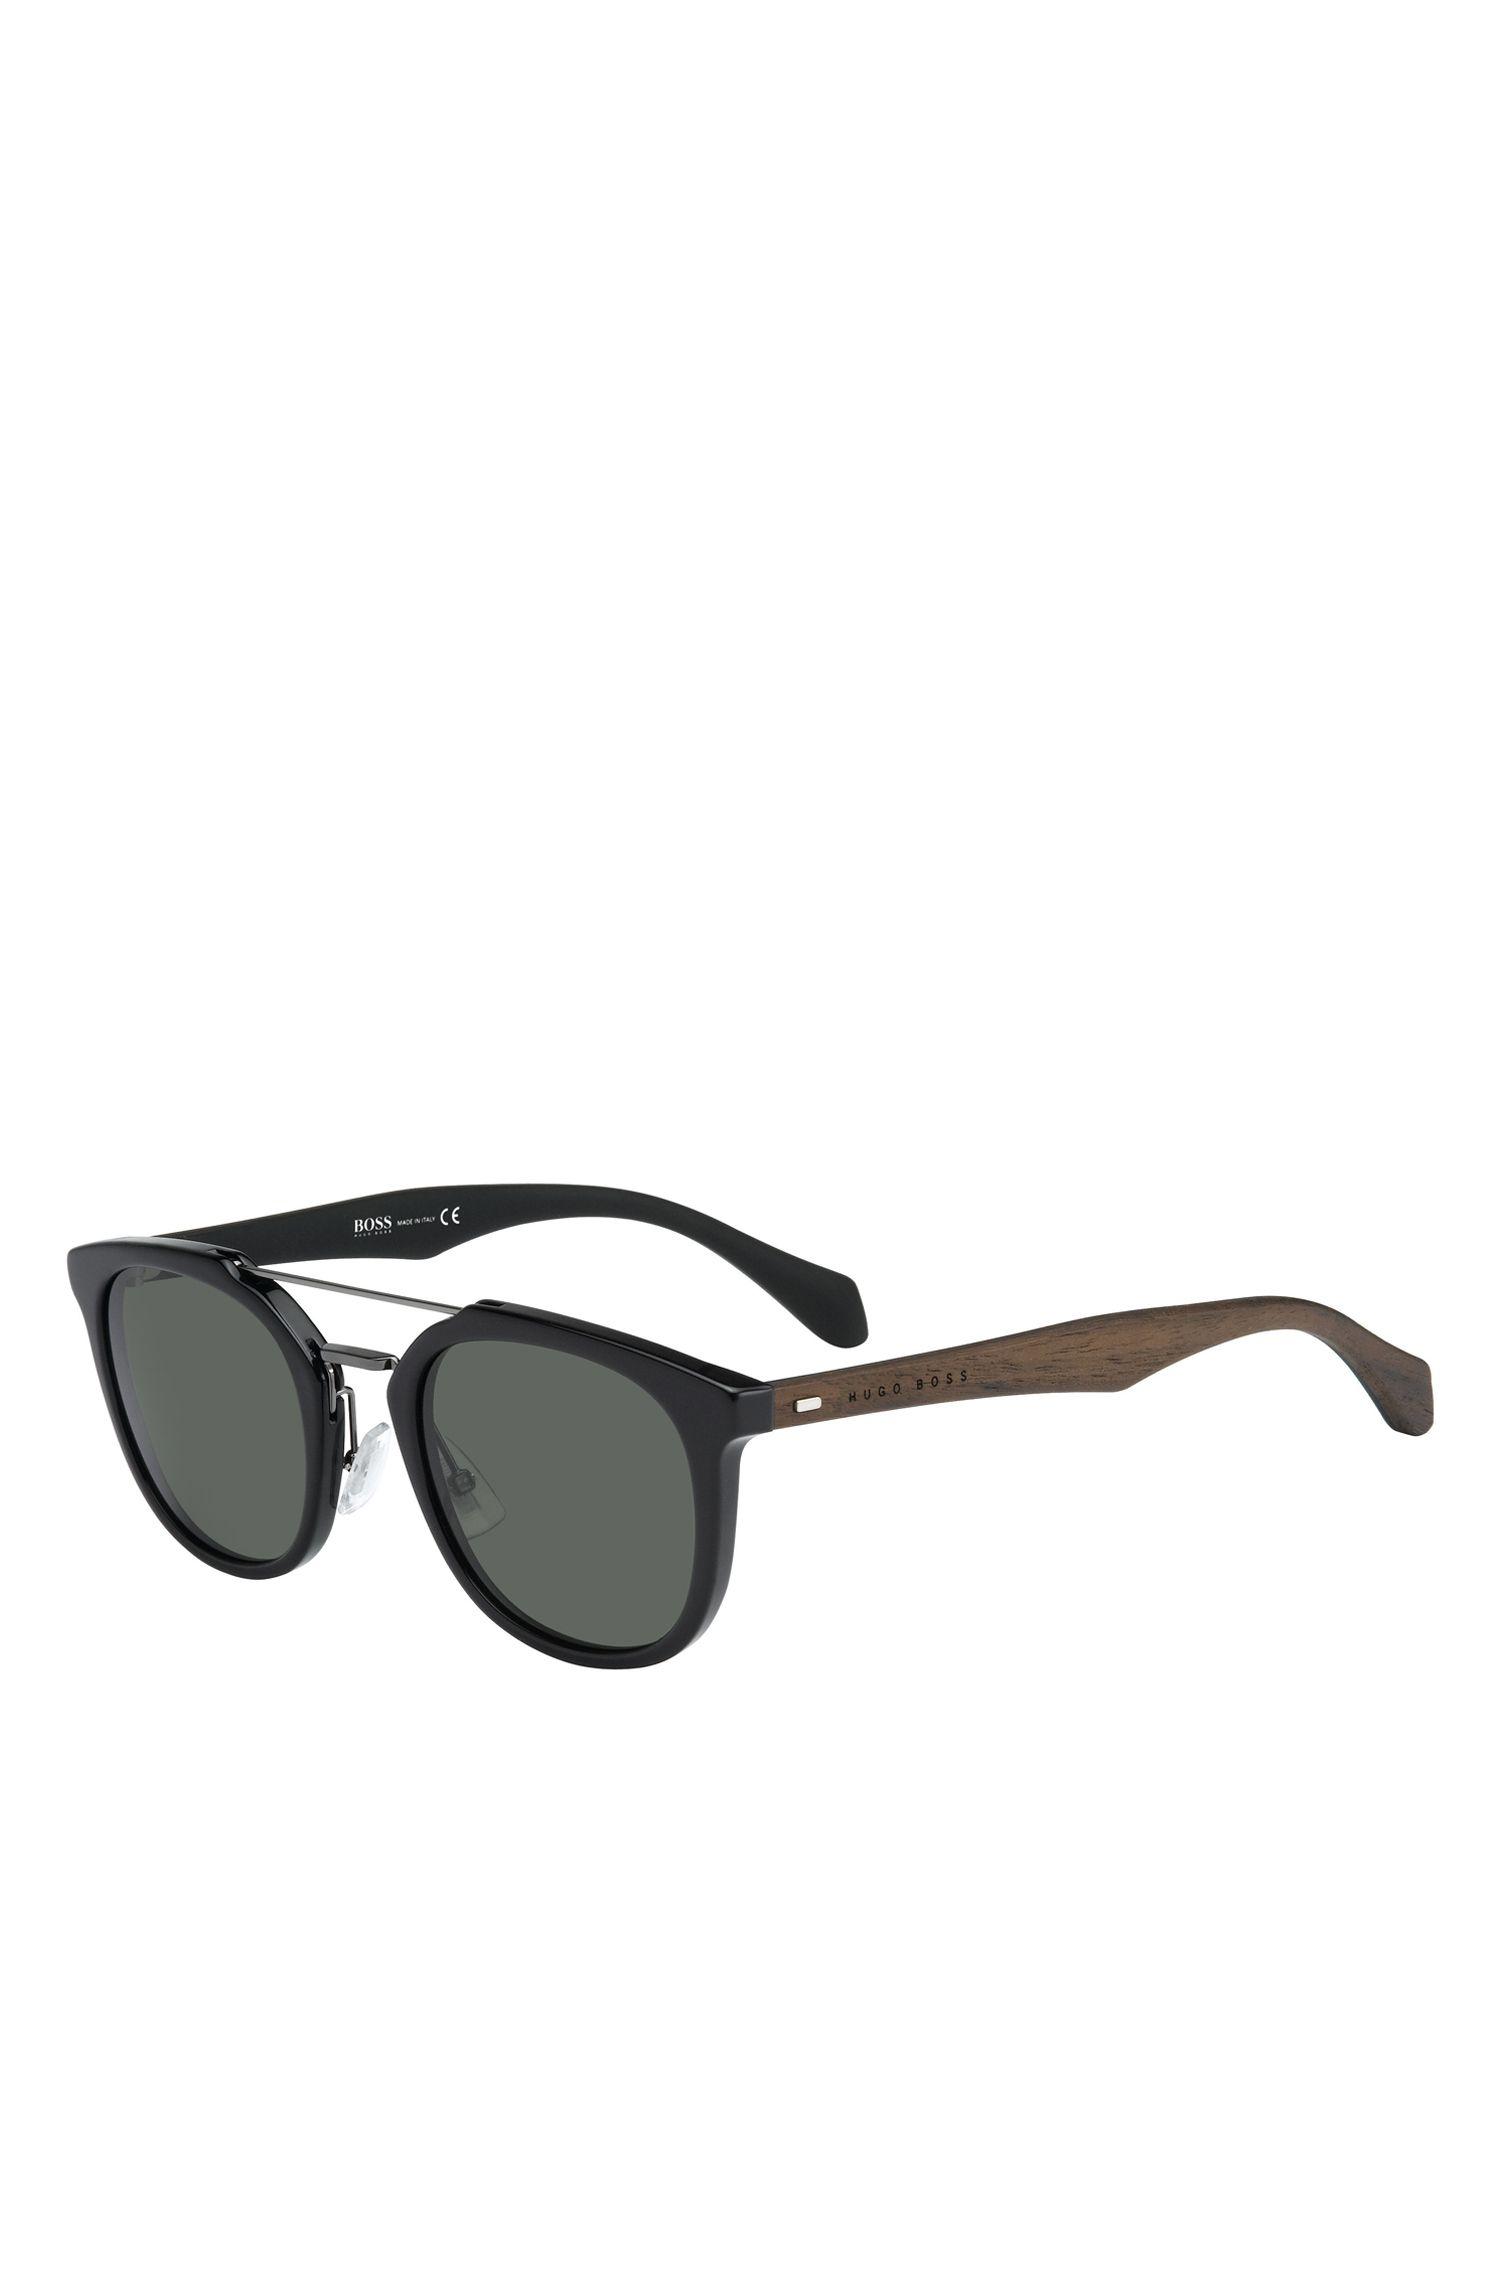 Gray Green Lens Clubmaster Sunglasses | BOSS 0777S